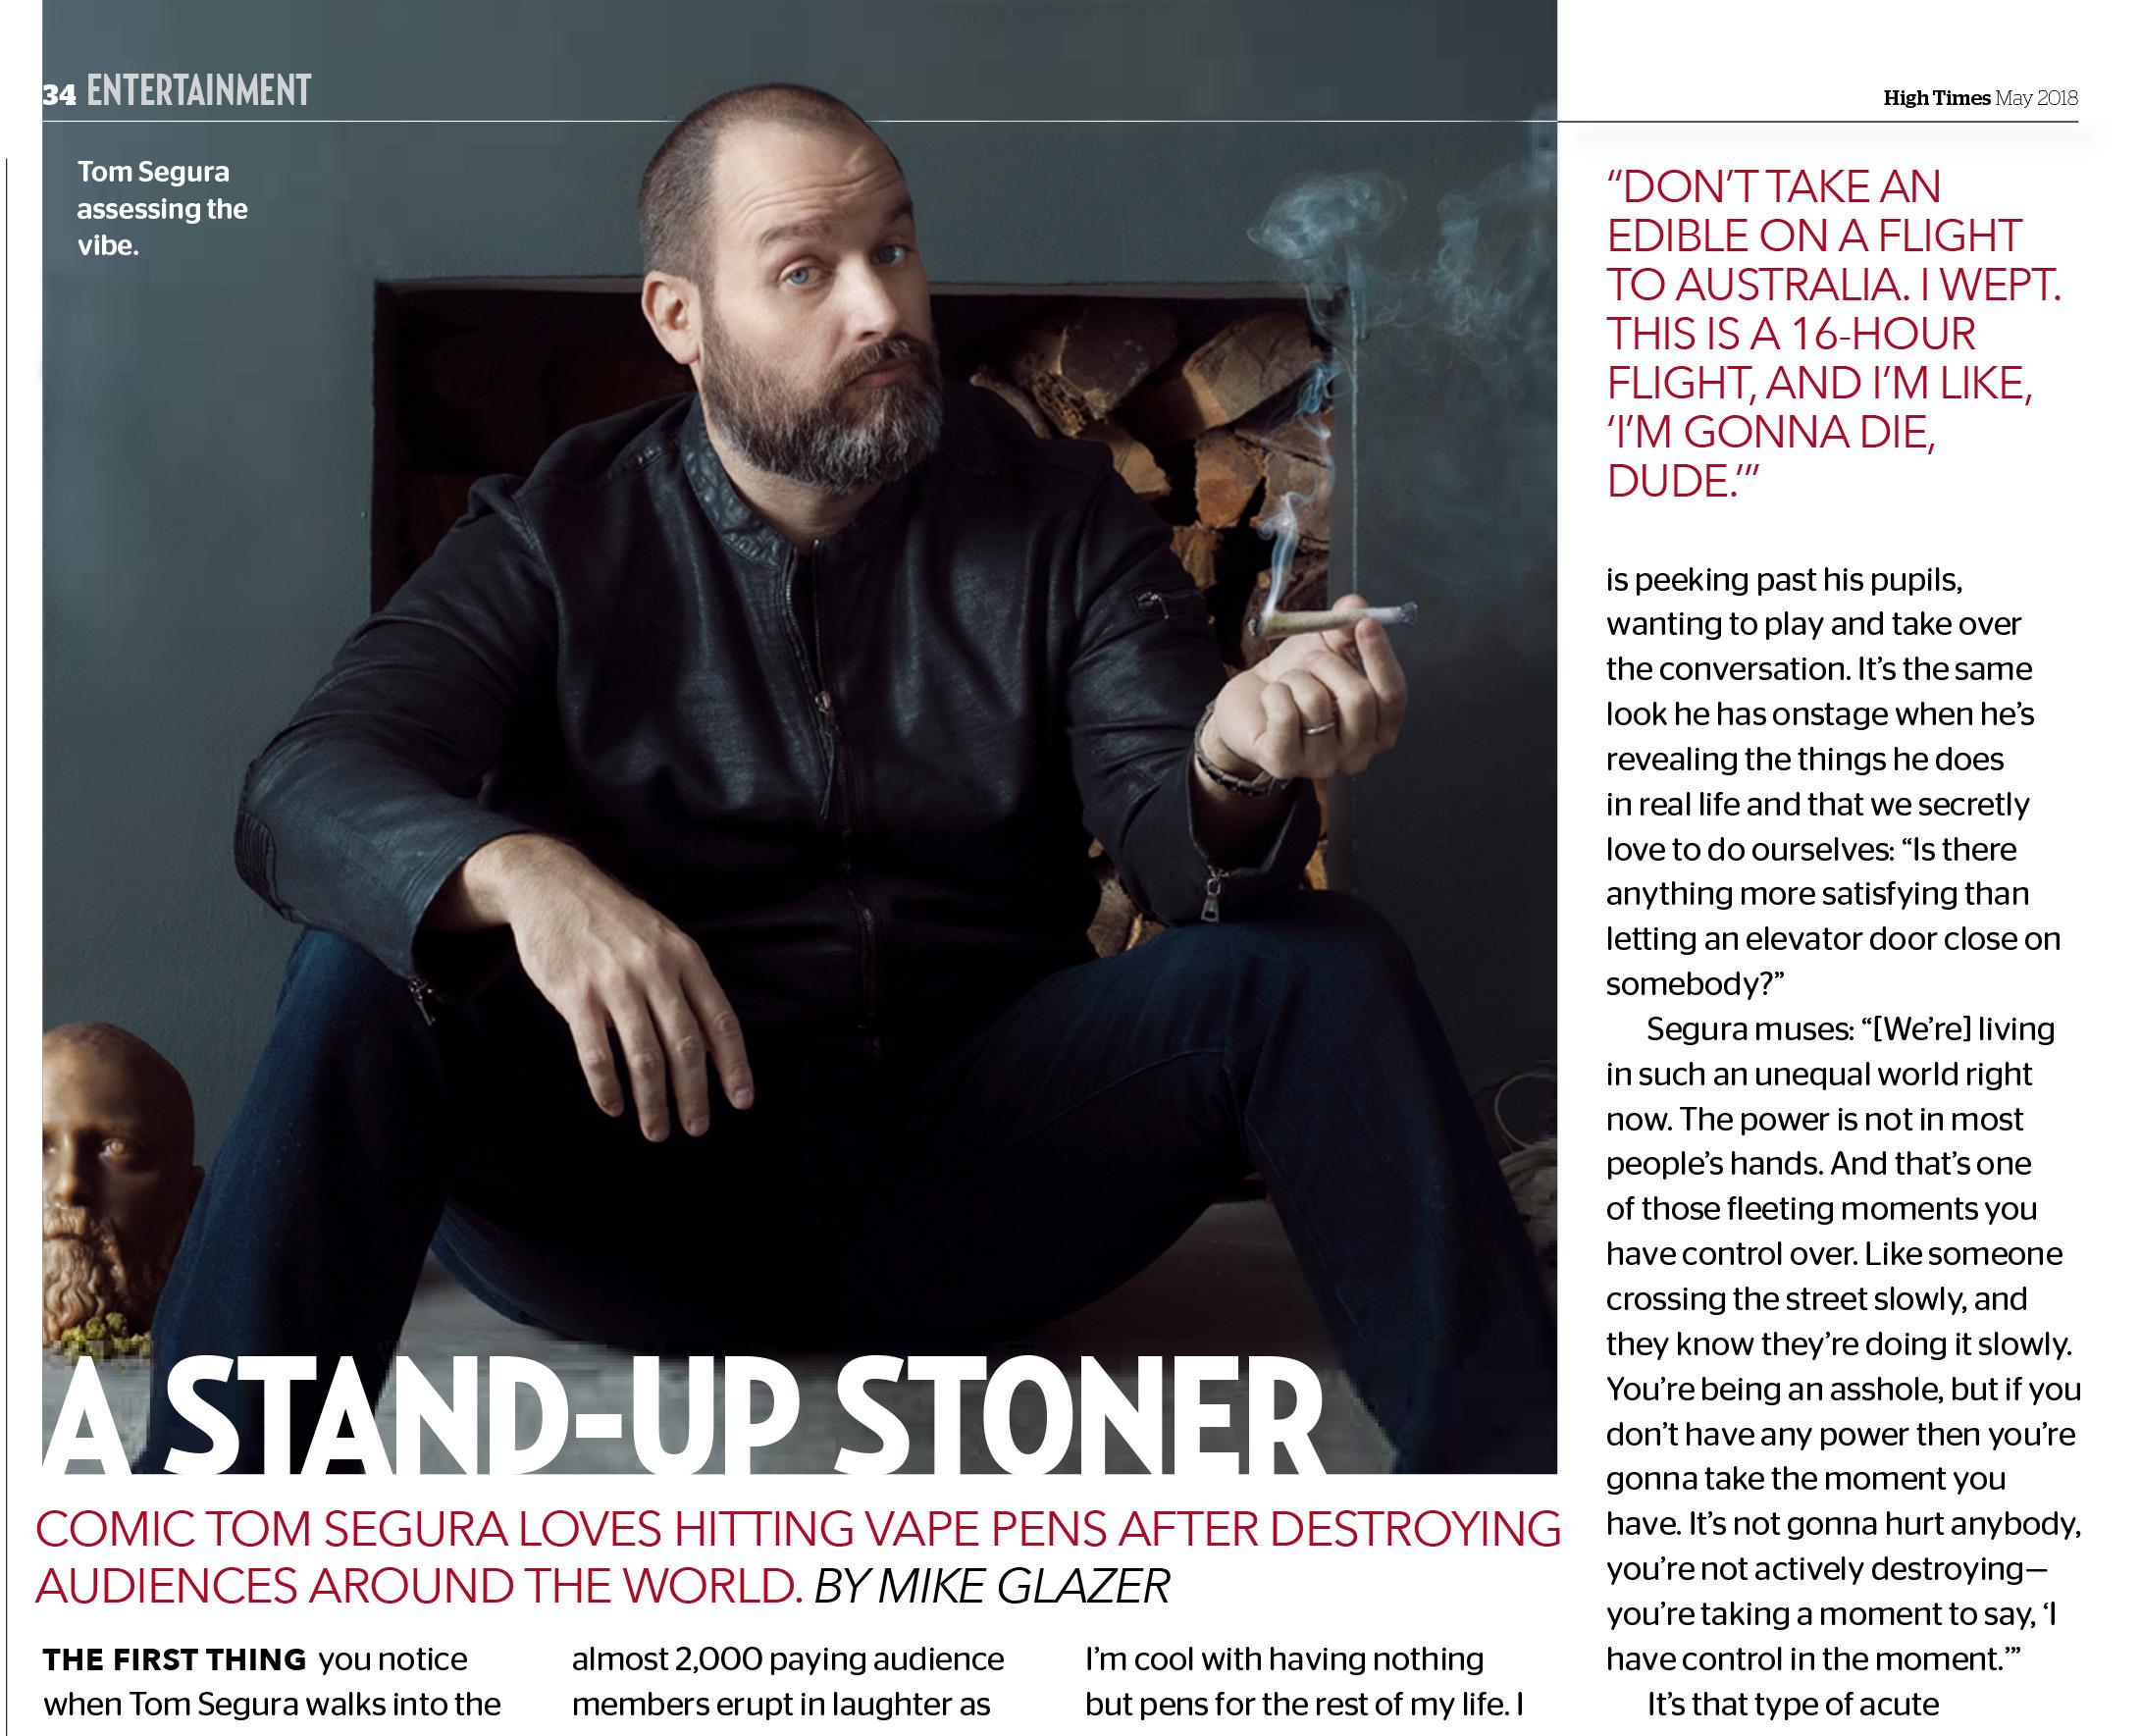 Tom Segura By Lauren Hurt for High Times Magazine